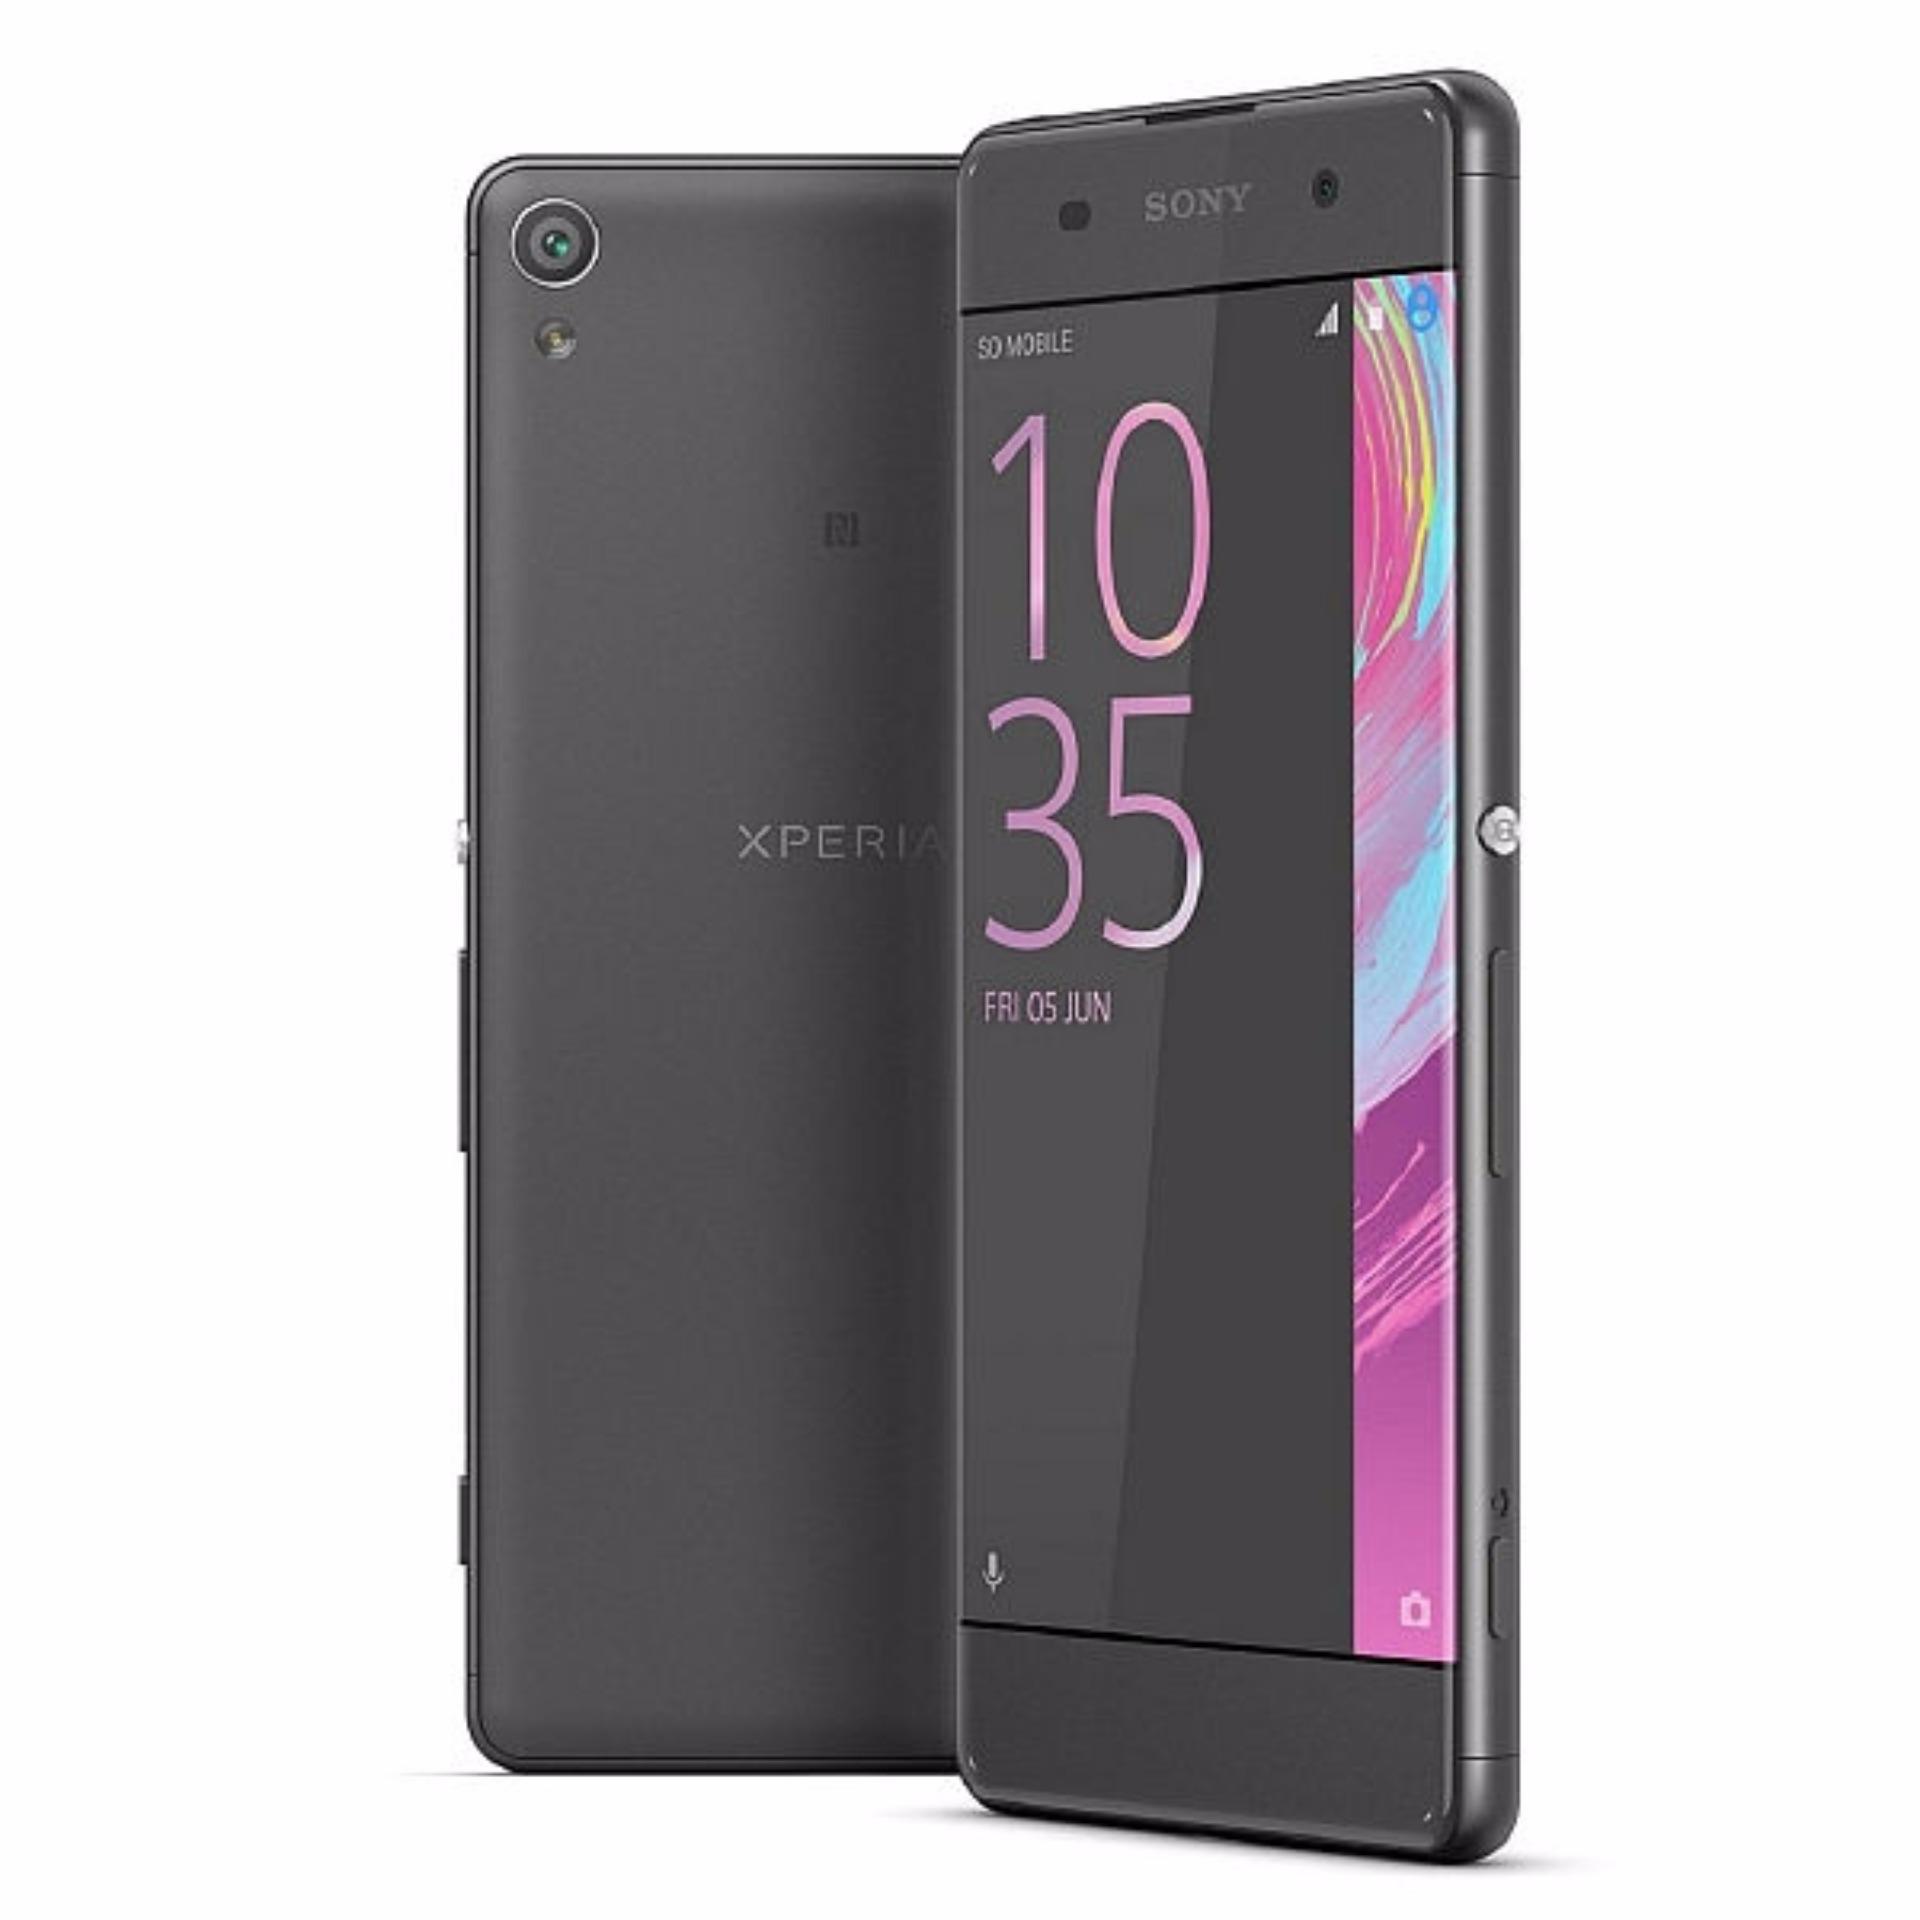 Sony Xperia Xa Dual 16gb Black 1486959657 33372931 E4ca11fb4129ca25b173f98e1233054f